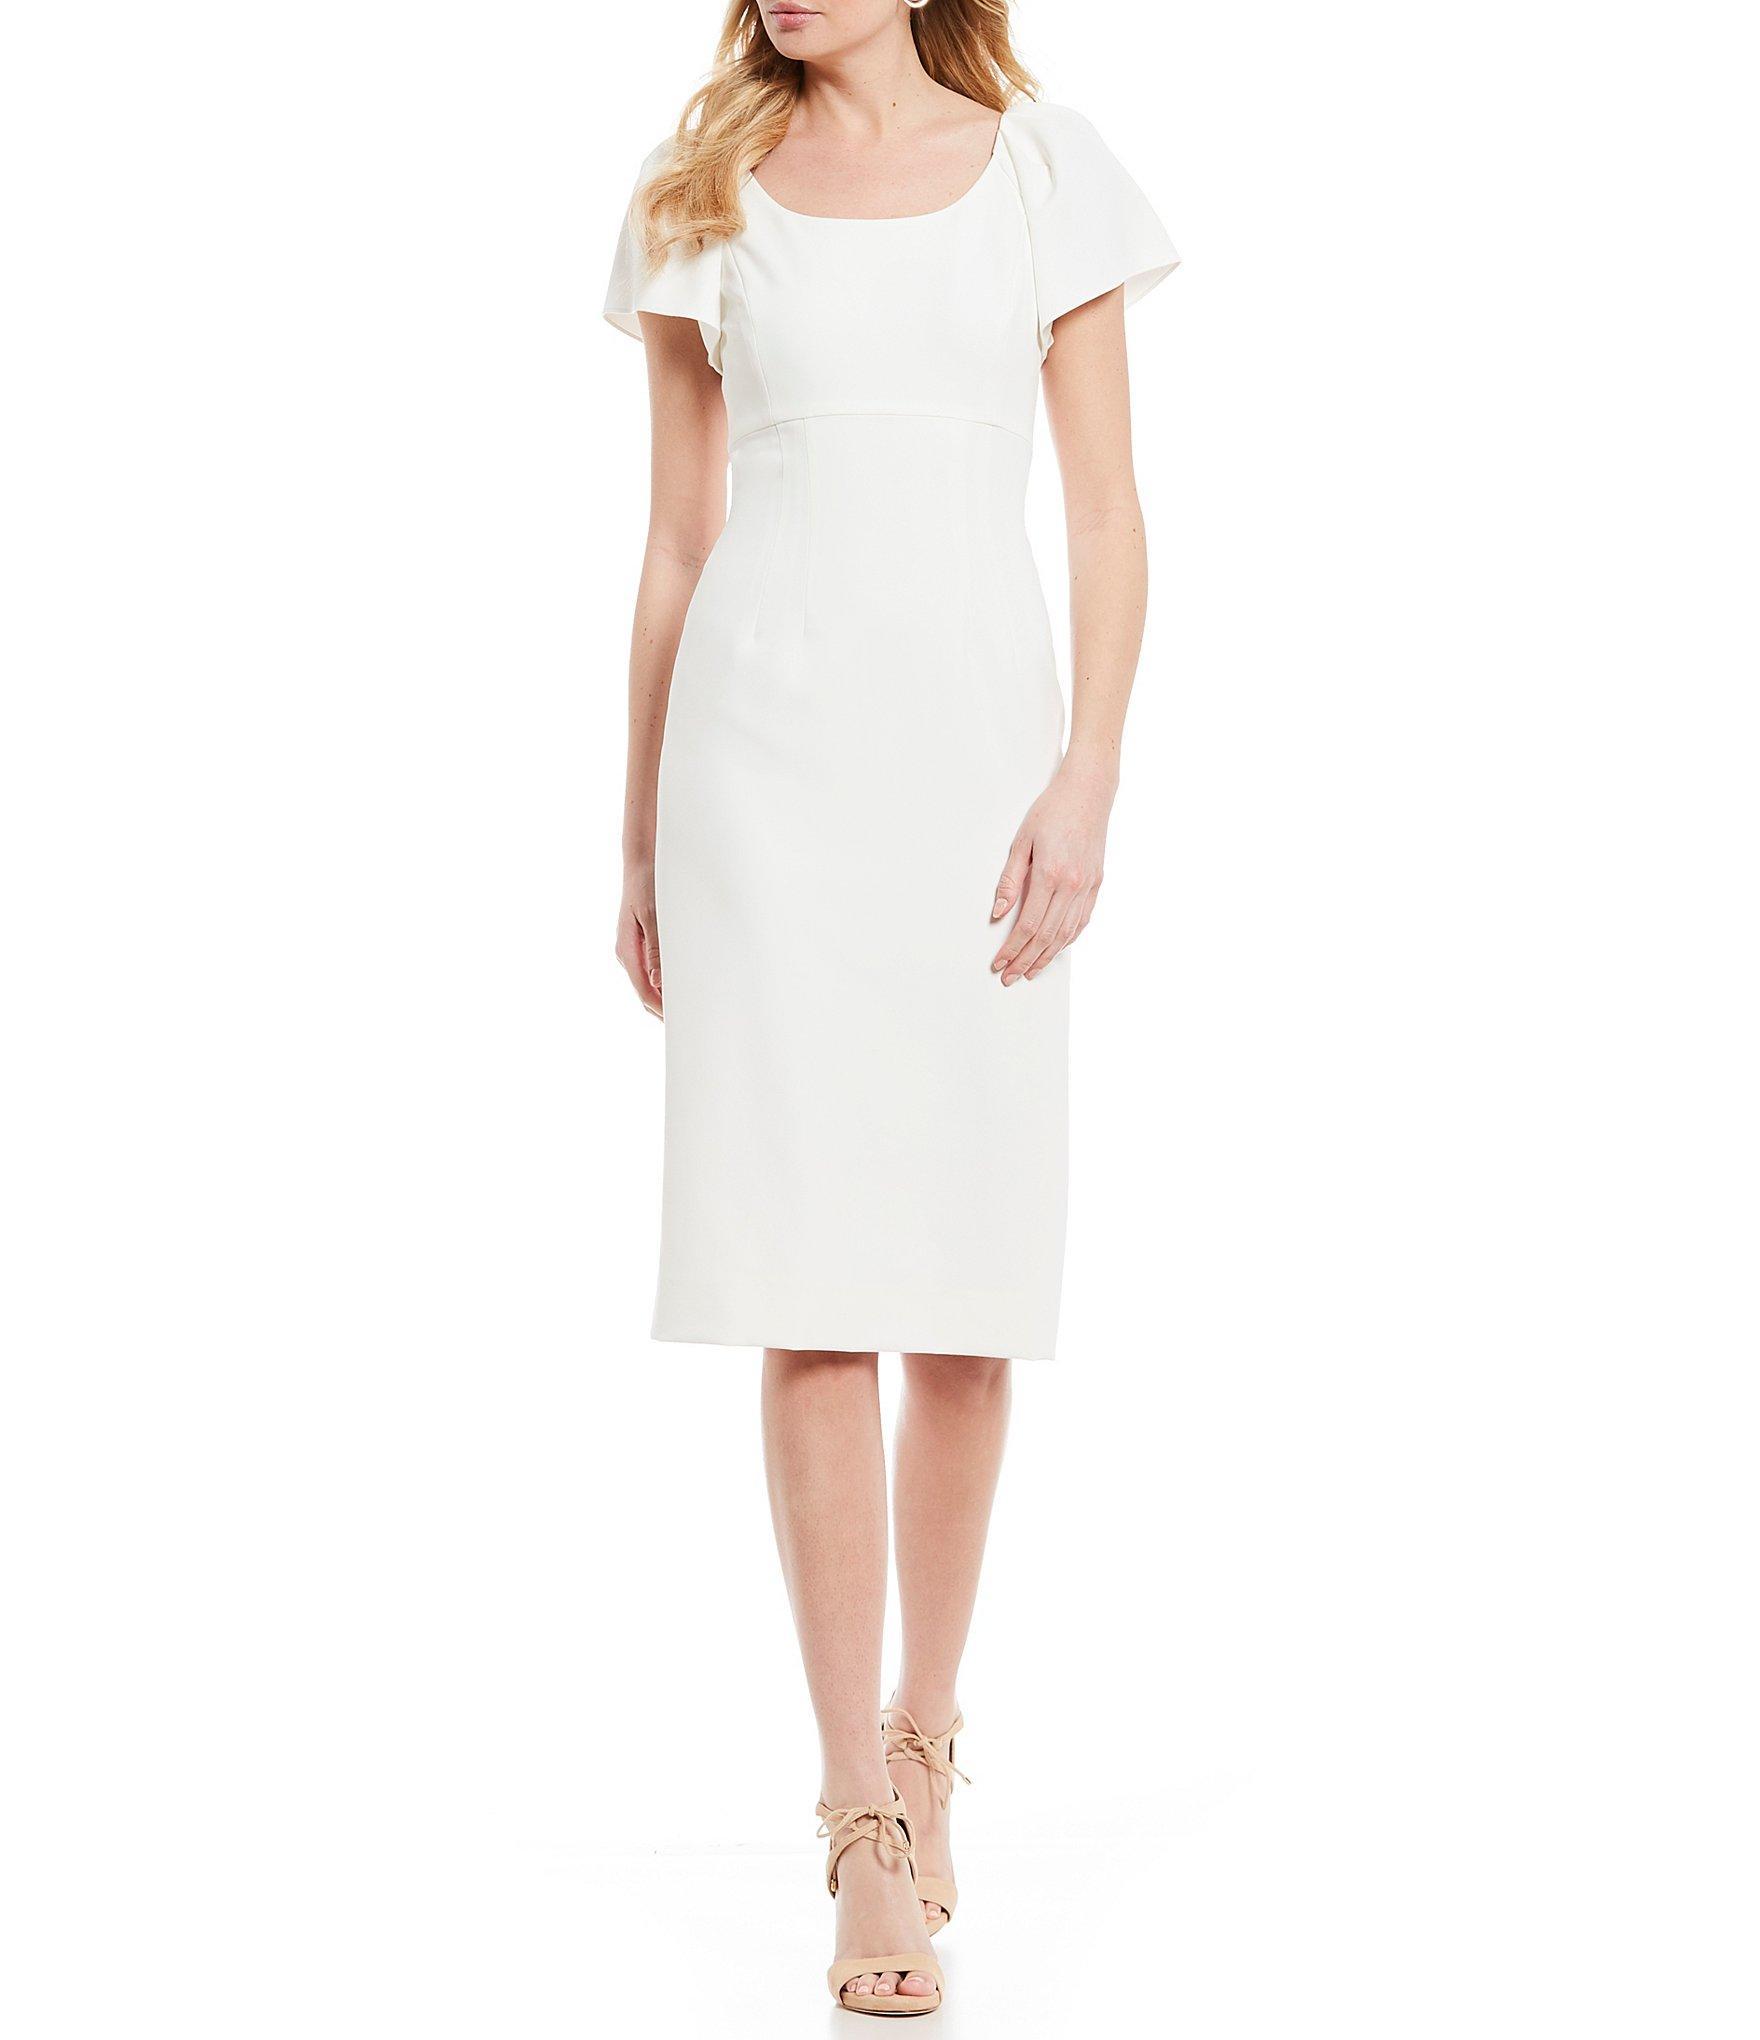 3dd5b9dd16f6 Lyst - Antonio Melani Karoline Sleeveless Sheath Dress in White